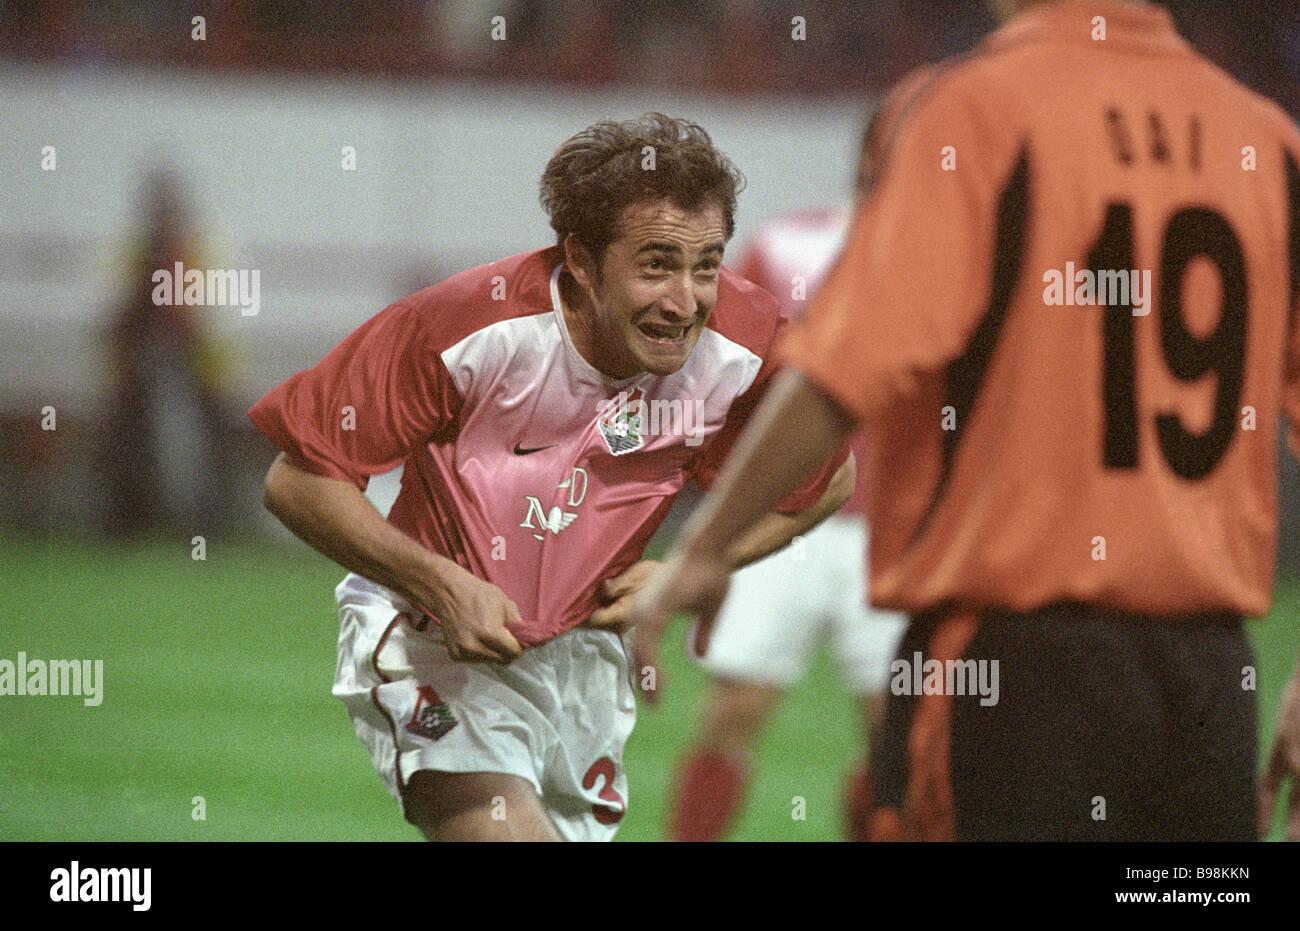 Mikhail Ashvetiya of Lokomotiv football team - Stock Image